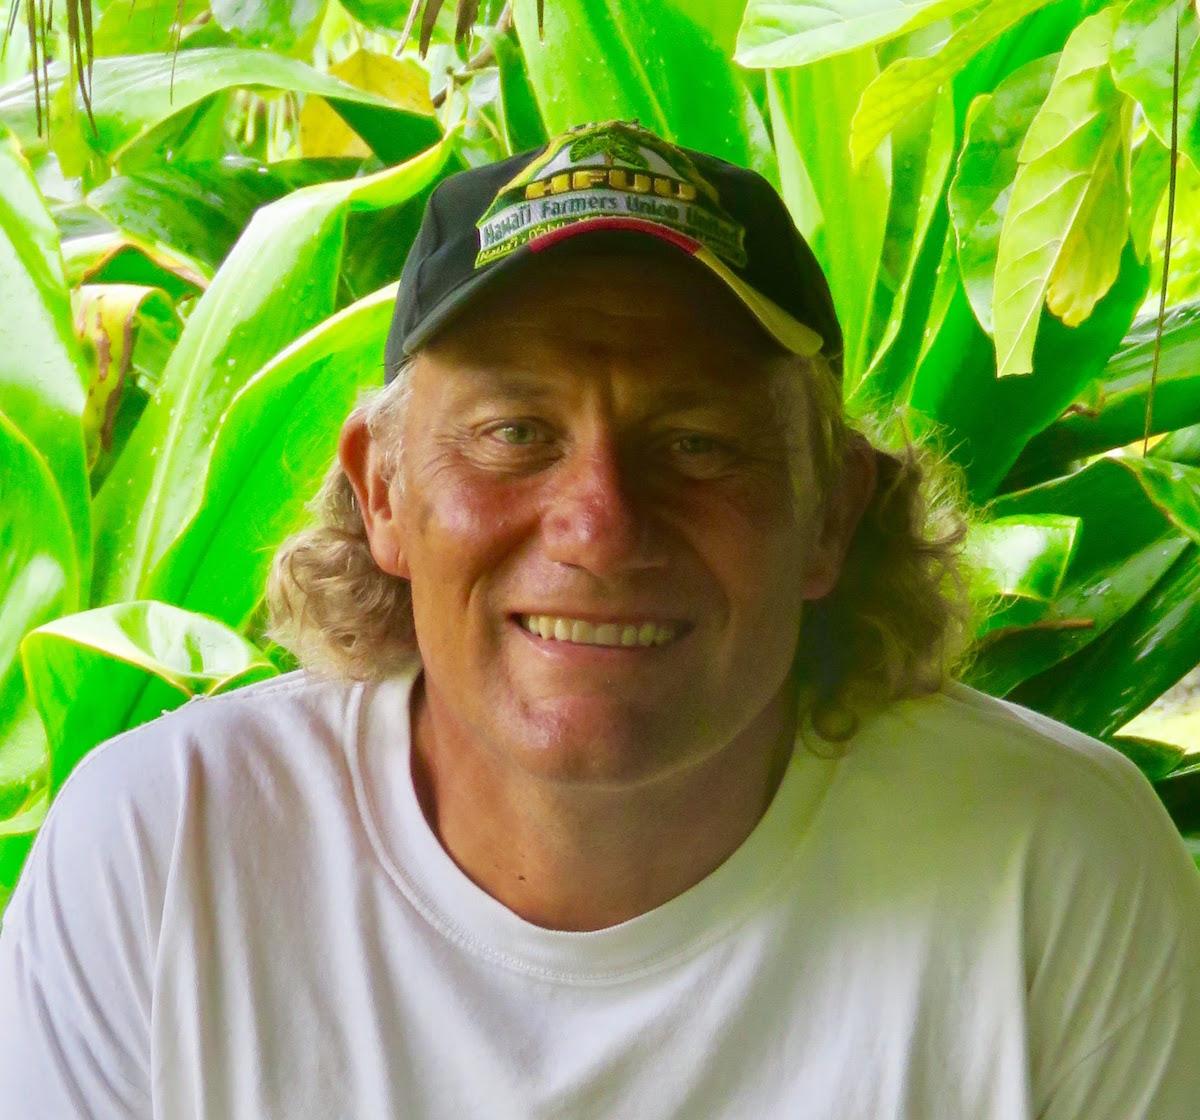 Chef John Cadman